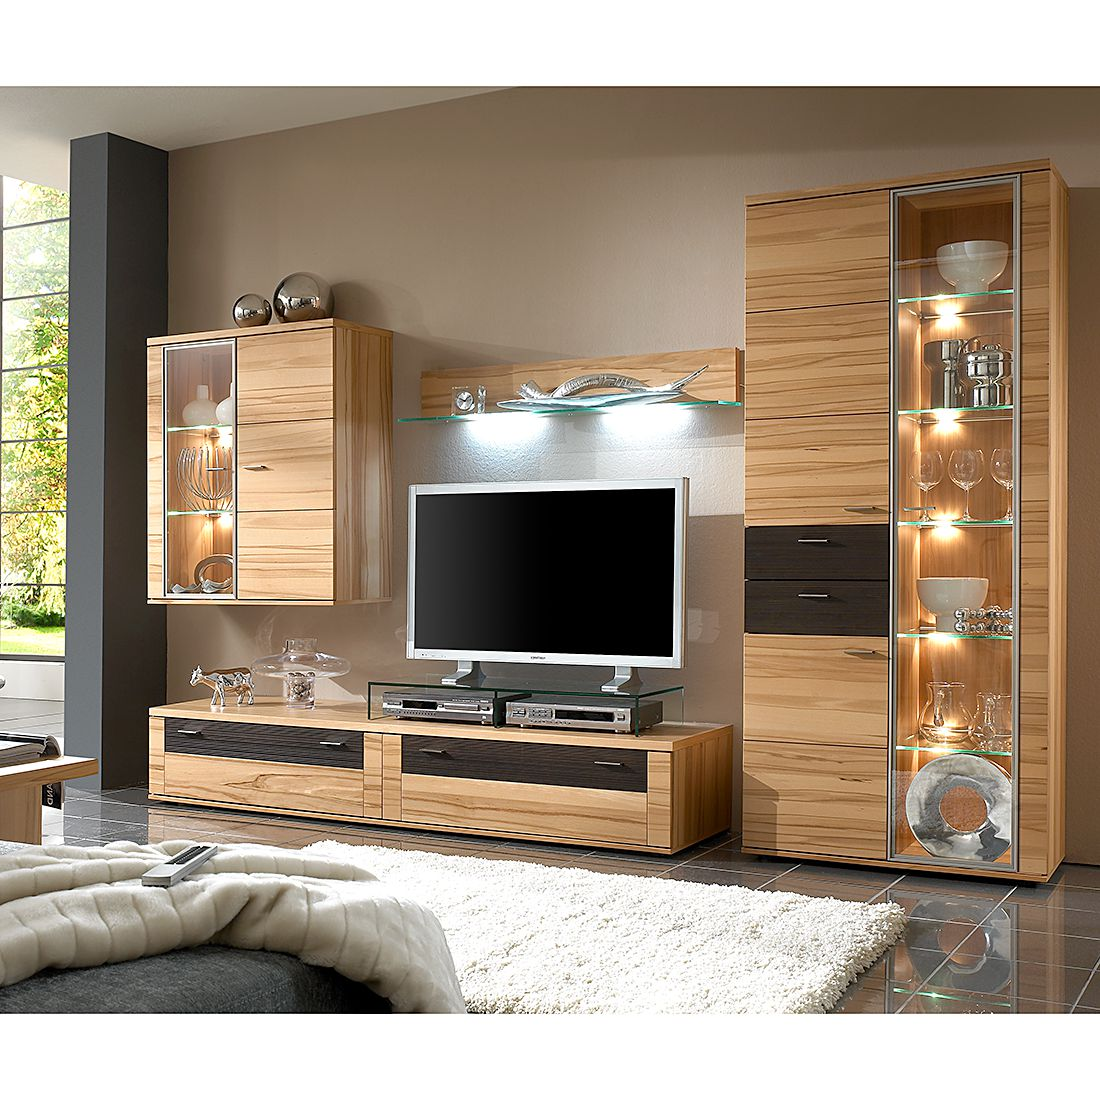 wohnwand vita iii 4 teilig kernbuche vitrinenelement rechts ohne beleuchtung ohne tv. Black Bedroom Furniture Sets. Home Design Ideas